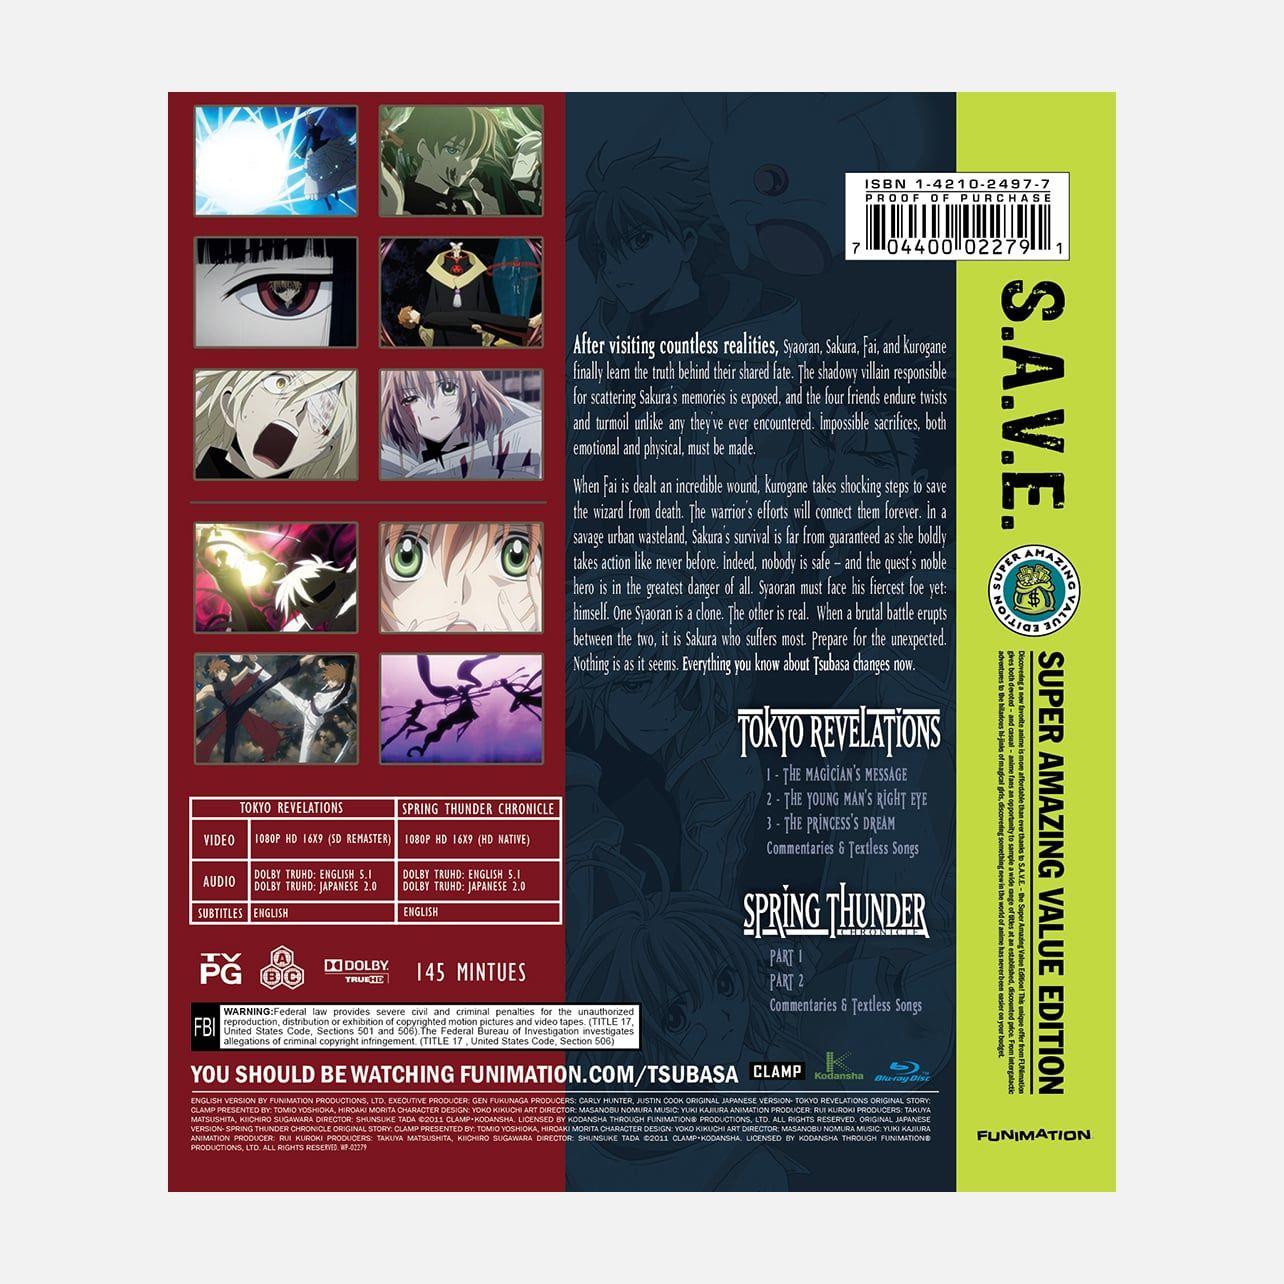 OVA Blu-ray Collection - S.A.V.E.